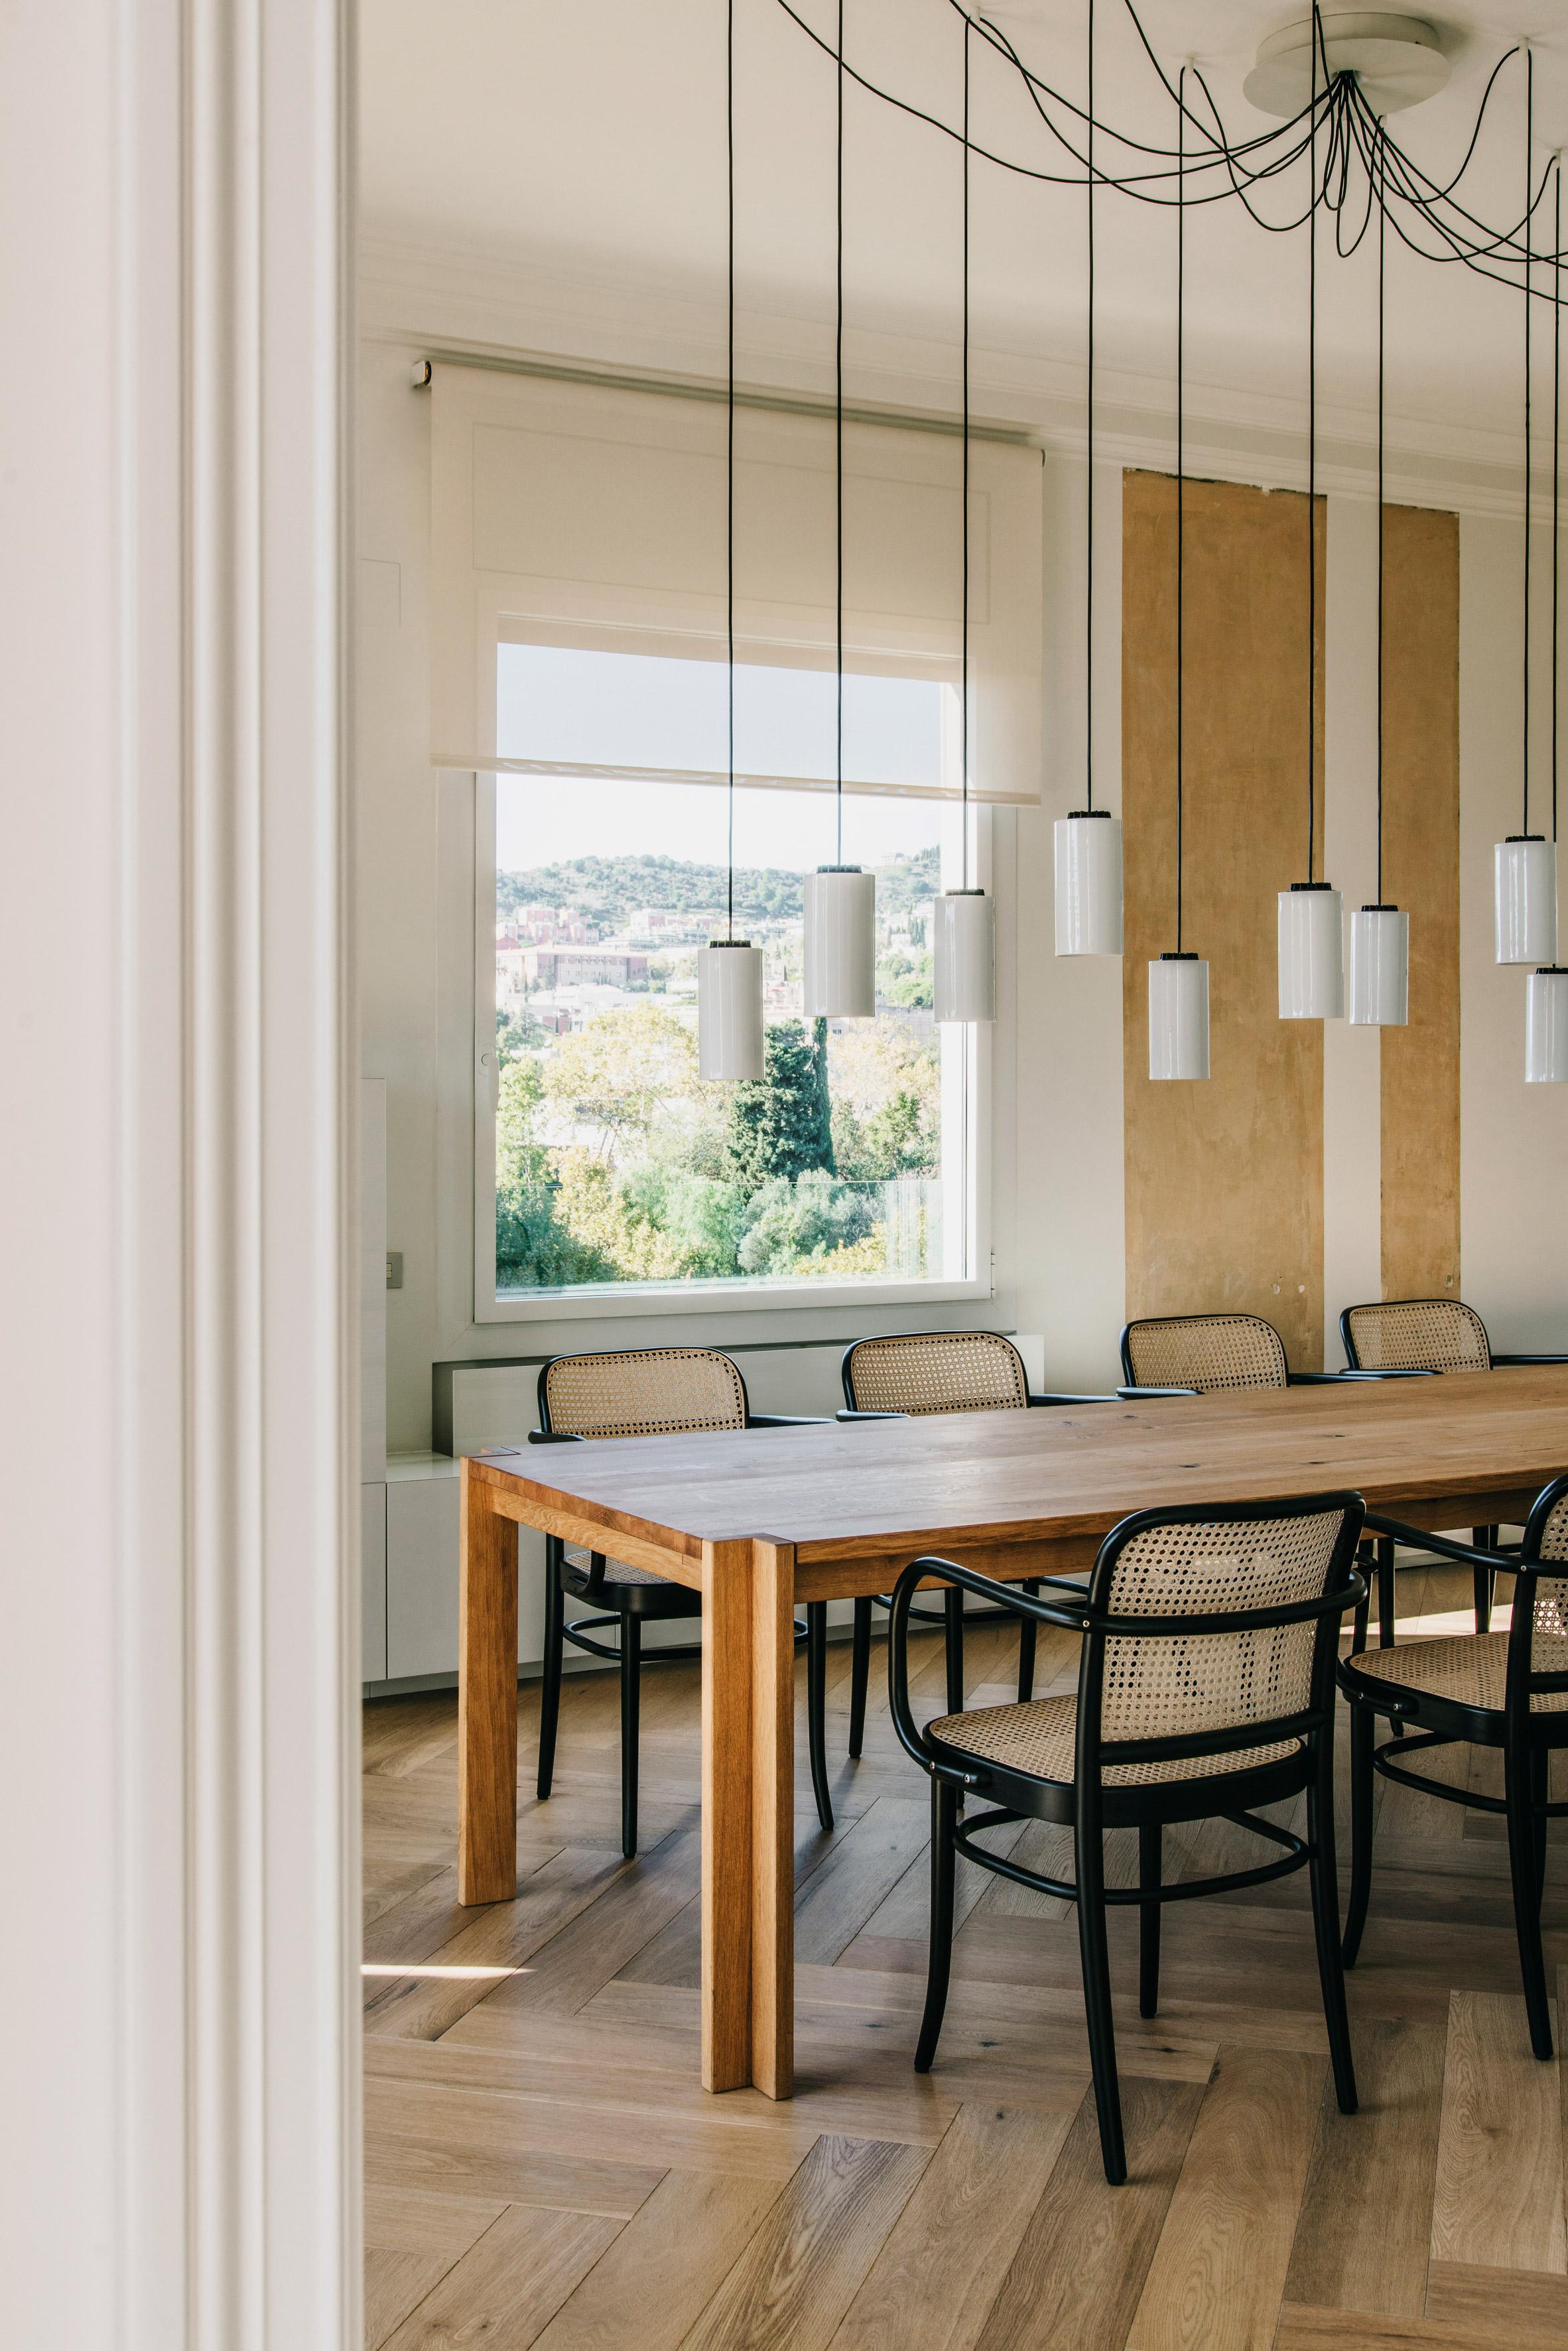 Sant Gervasi apartment by Isabel Lopez Vilalta